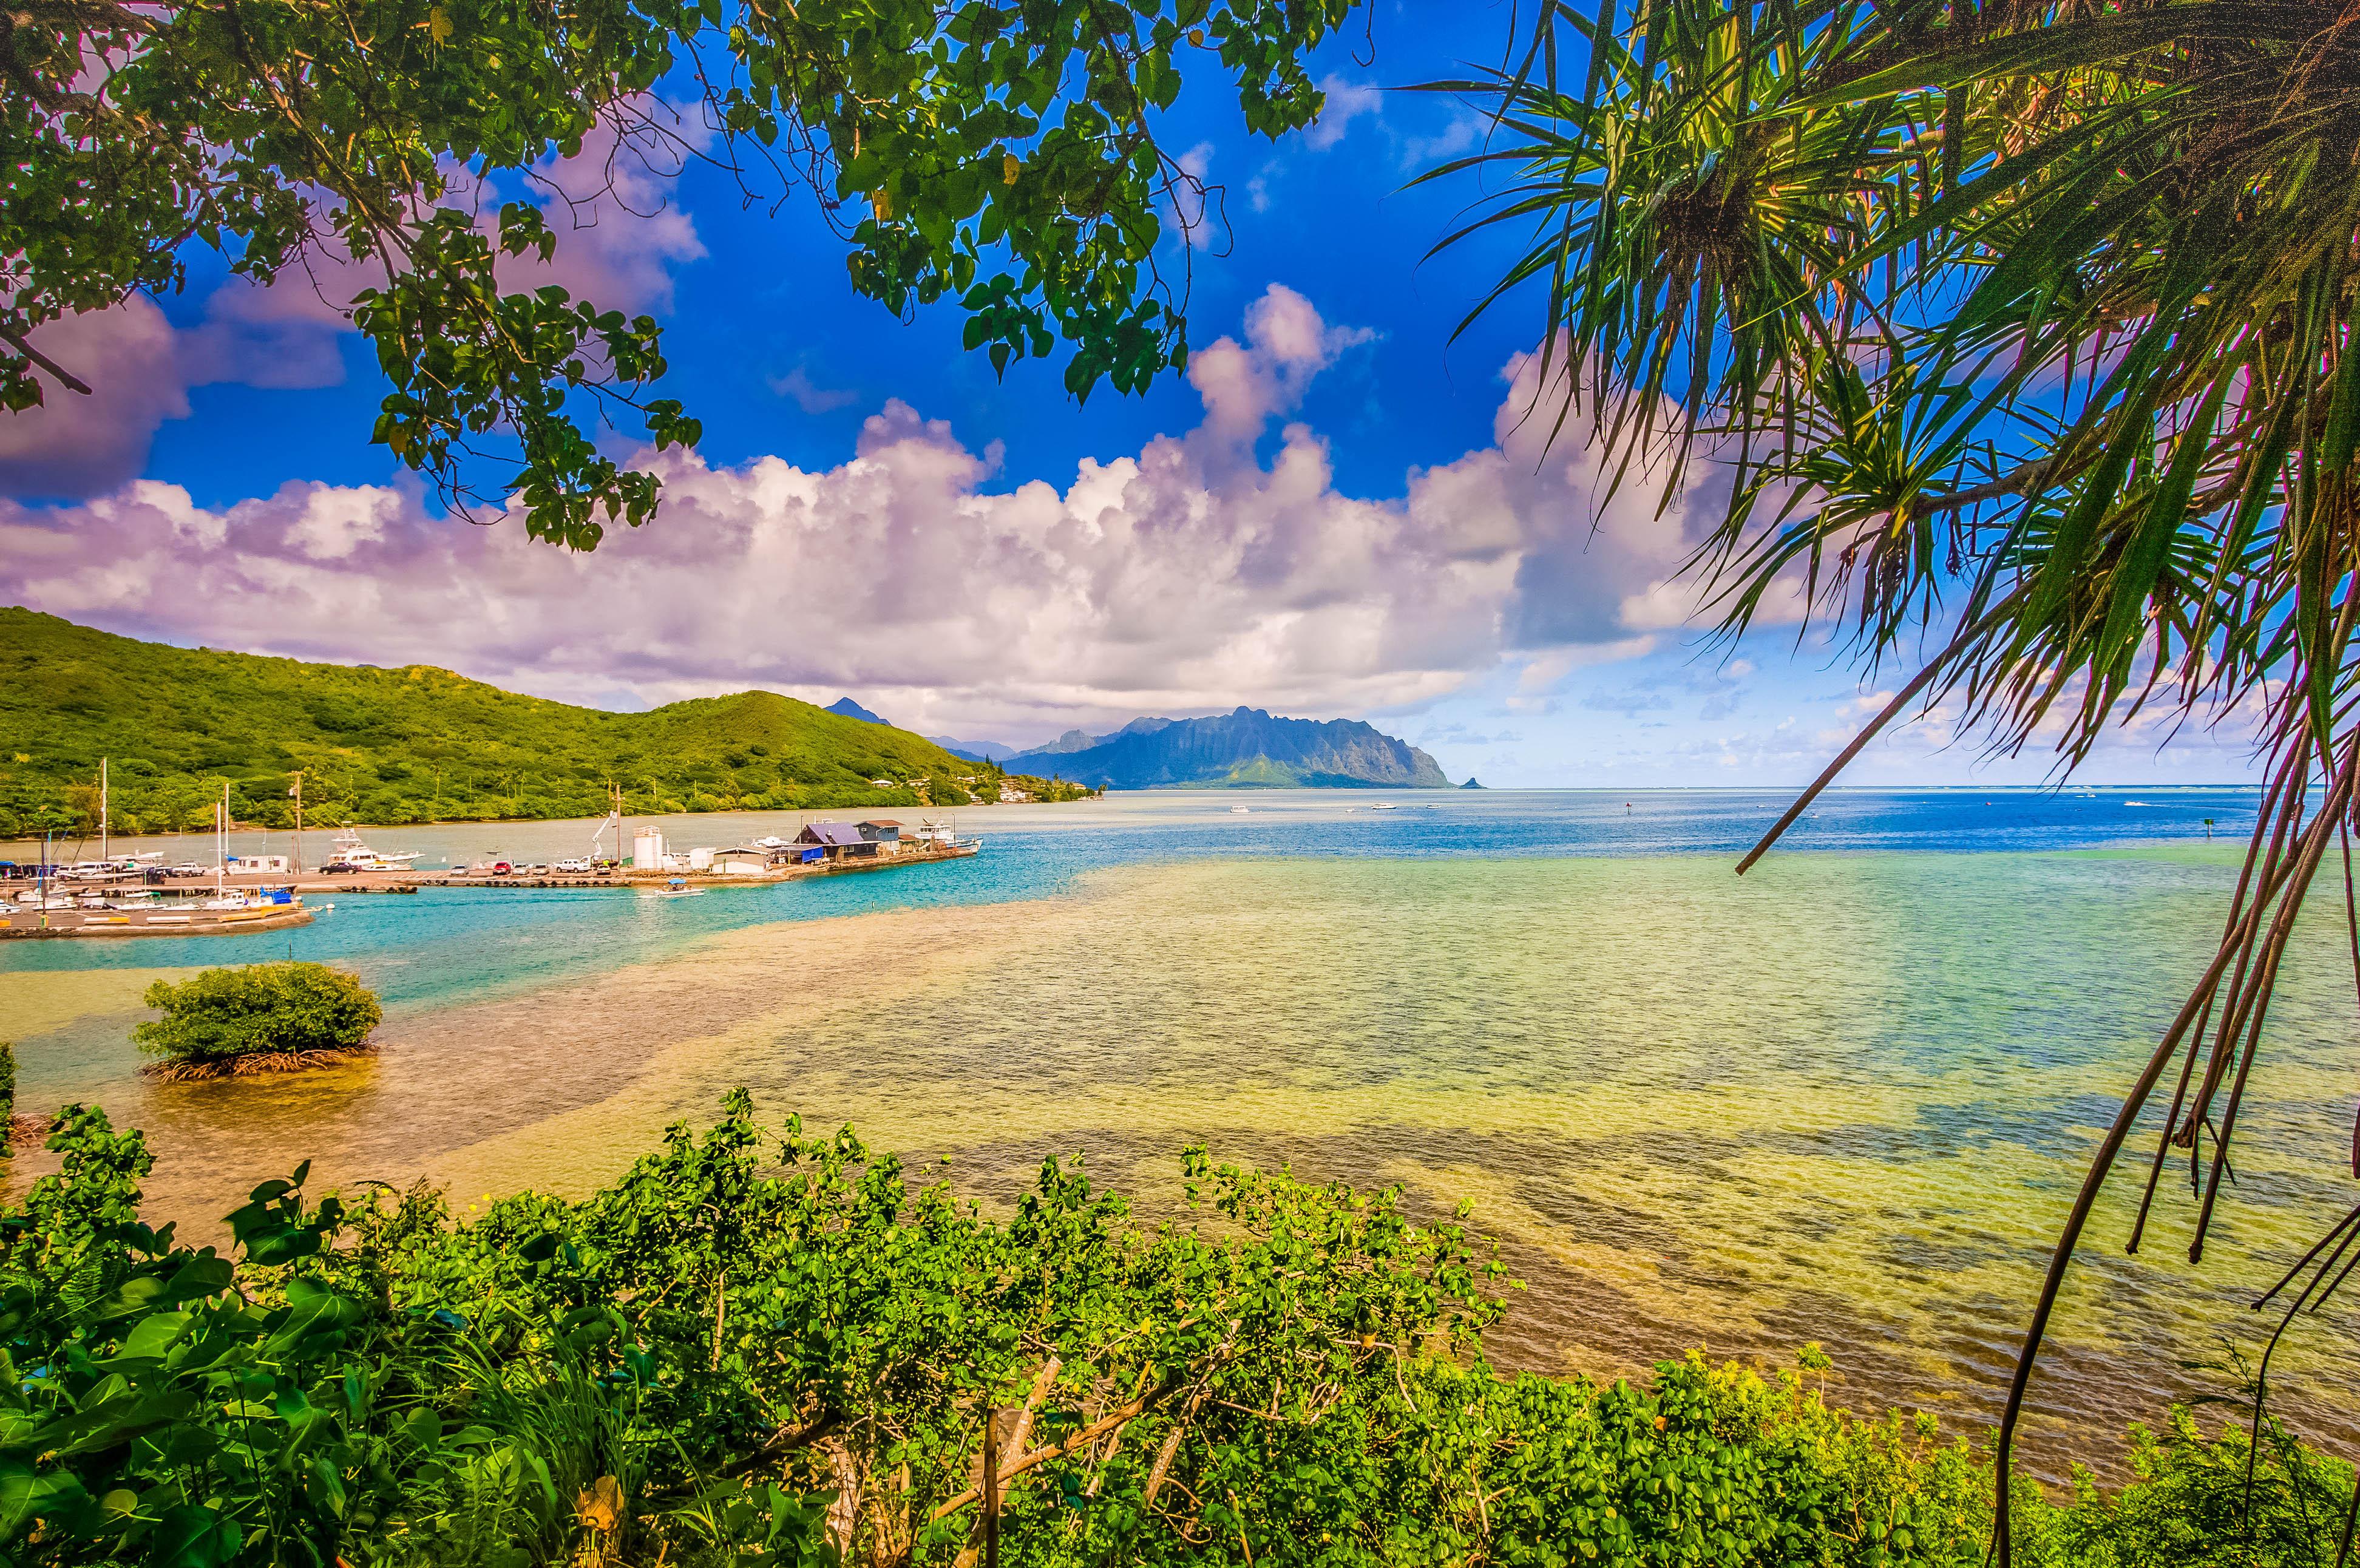 обои Гавайи, море, остров, берег картинки фото